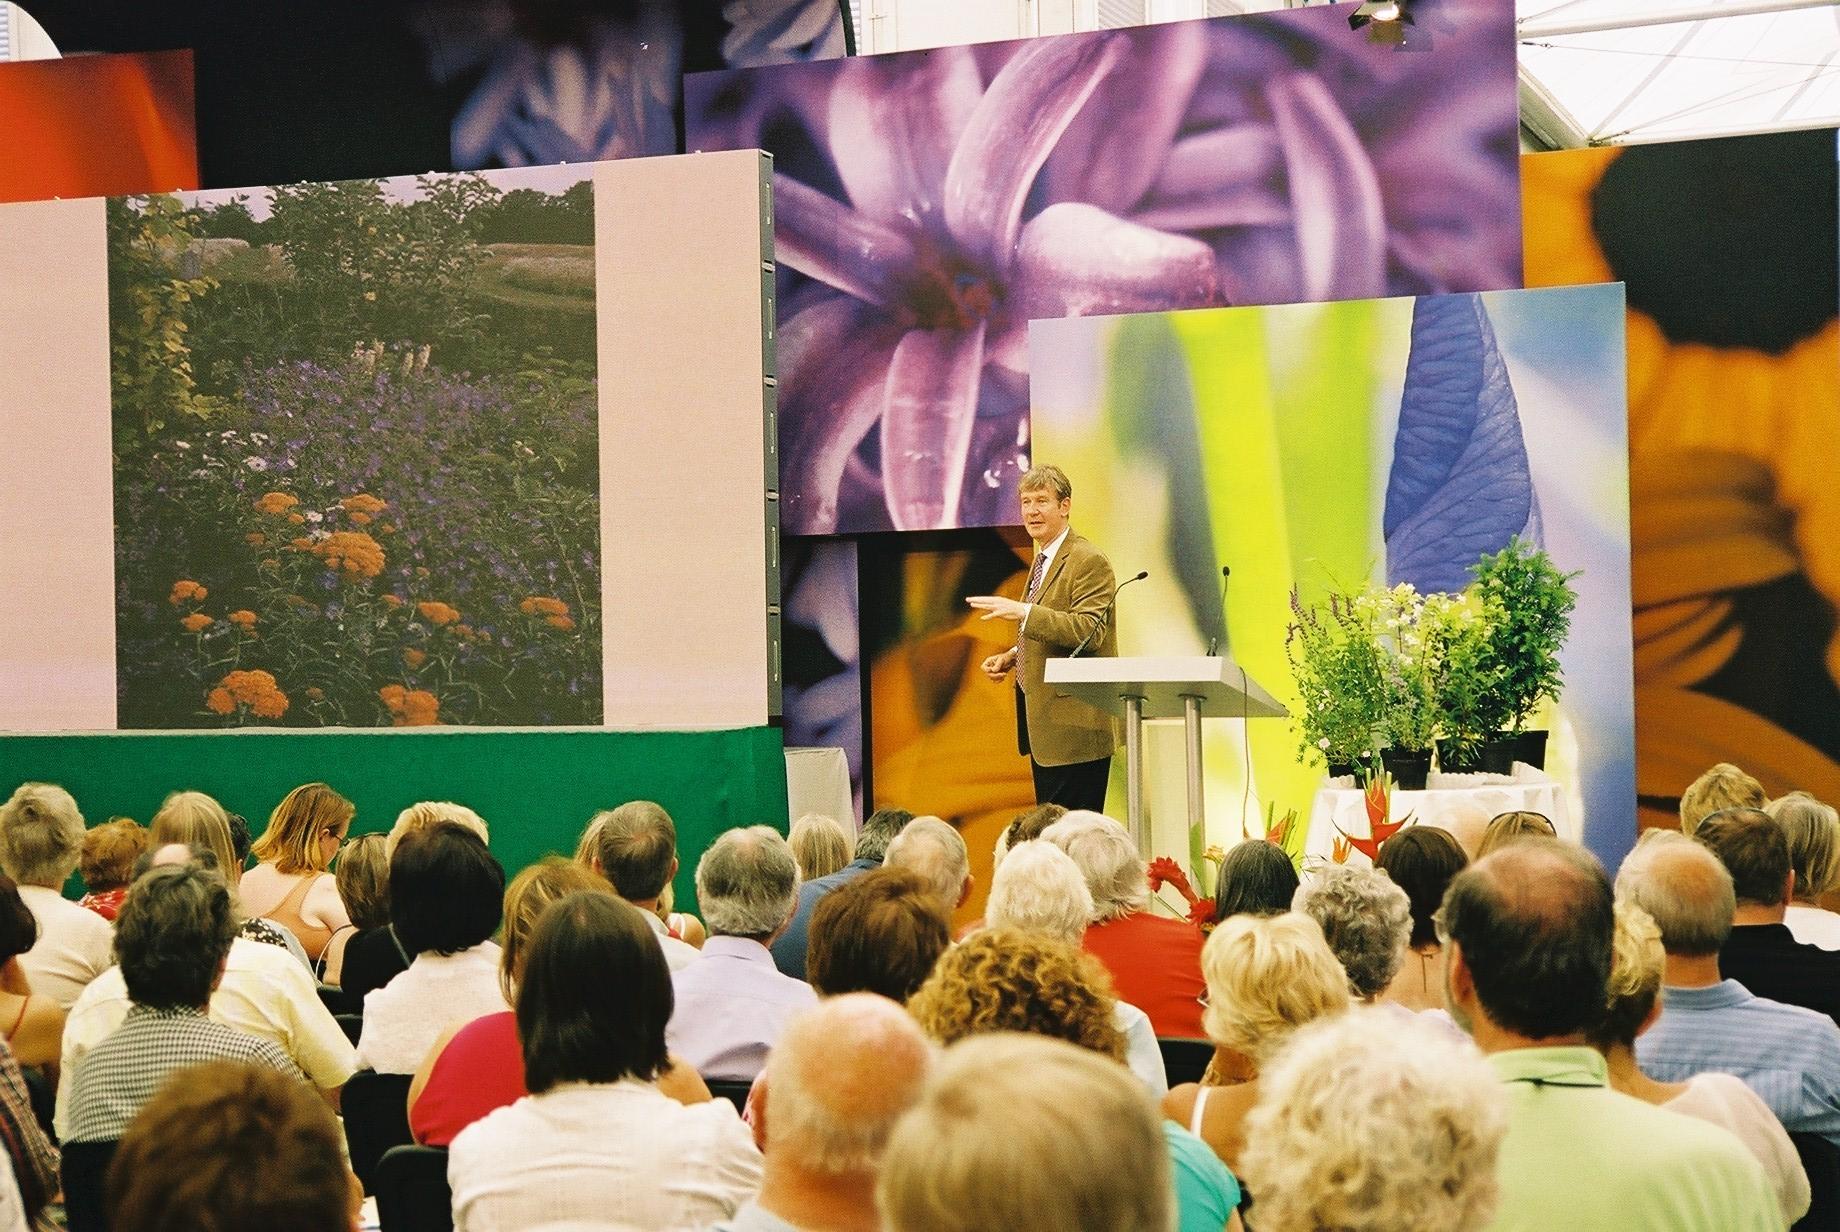 Roger Platts - Garden Talks, Industry Speakers, Events, Visits, Tours.